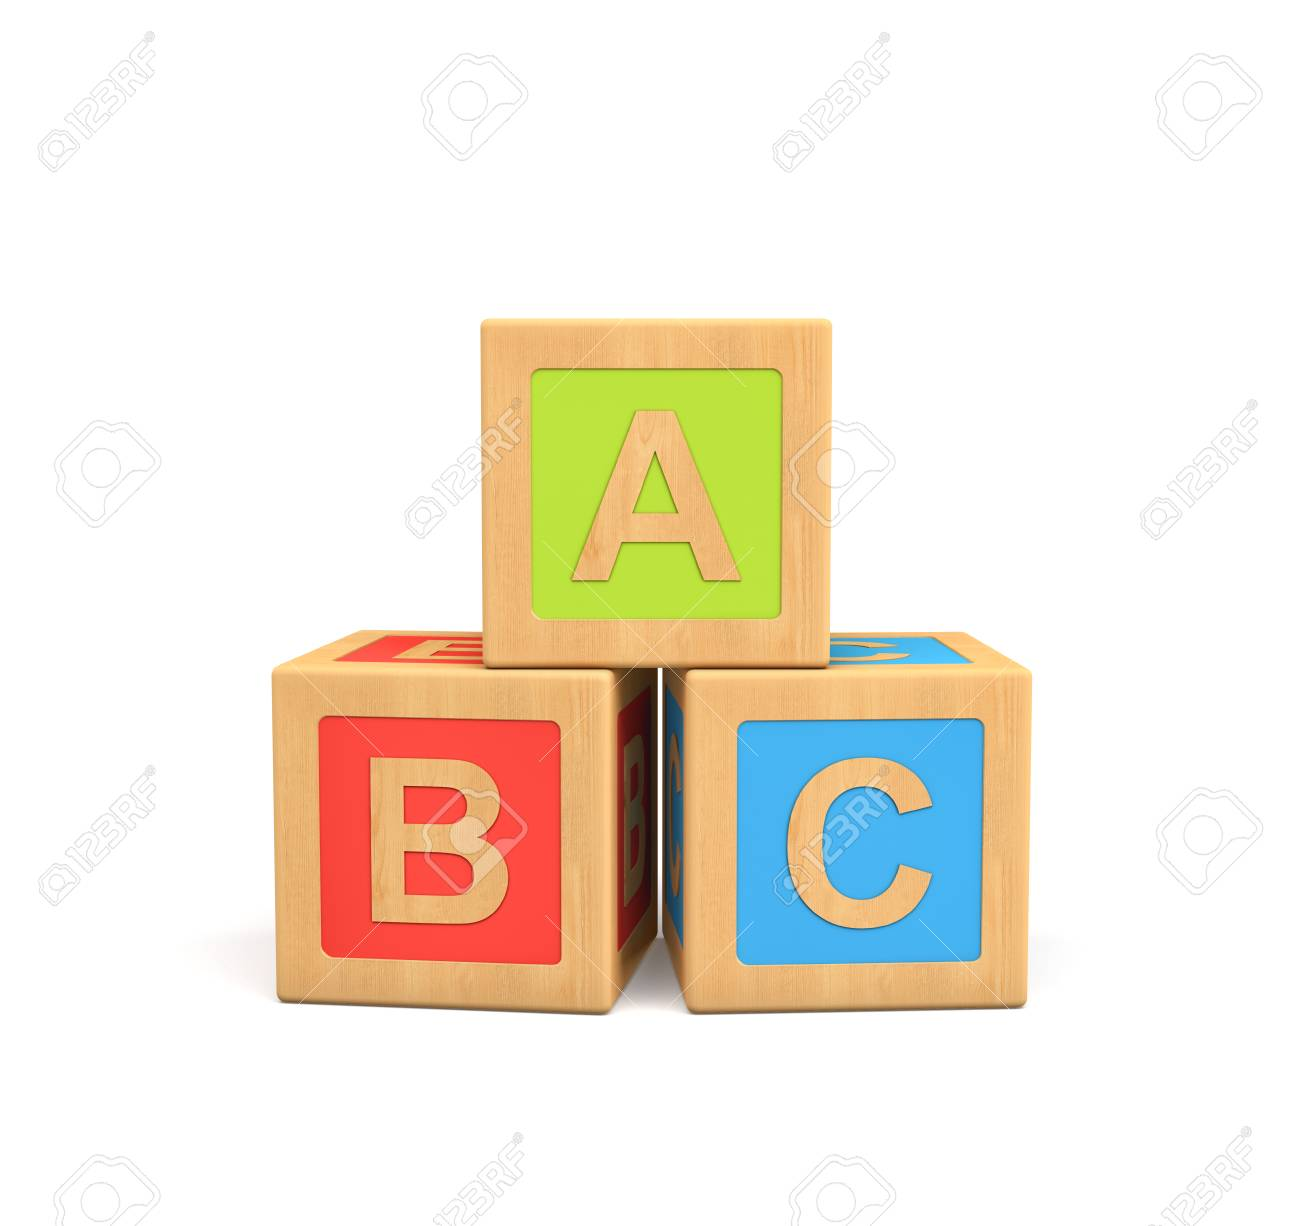 Representación 3d de tres cubos de juguete de madera con letras abc aislados sobre fondo blanco .